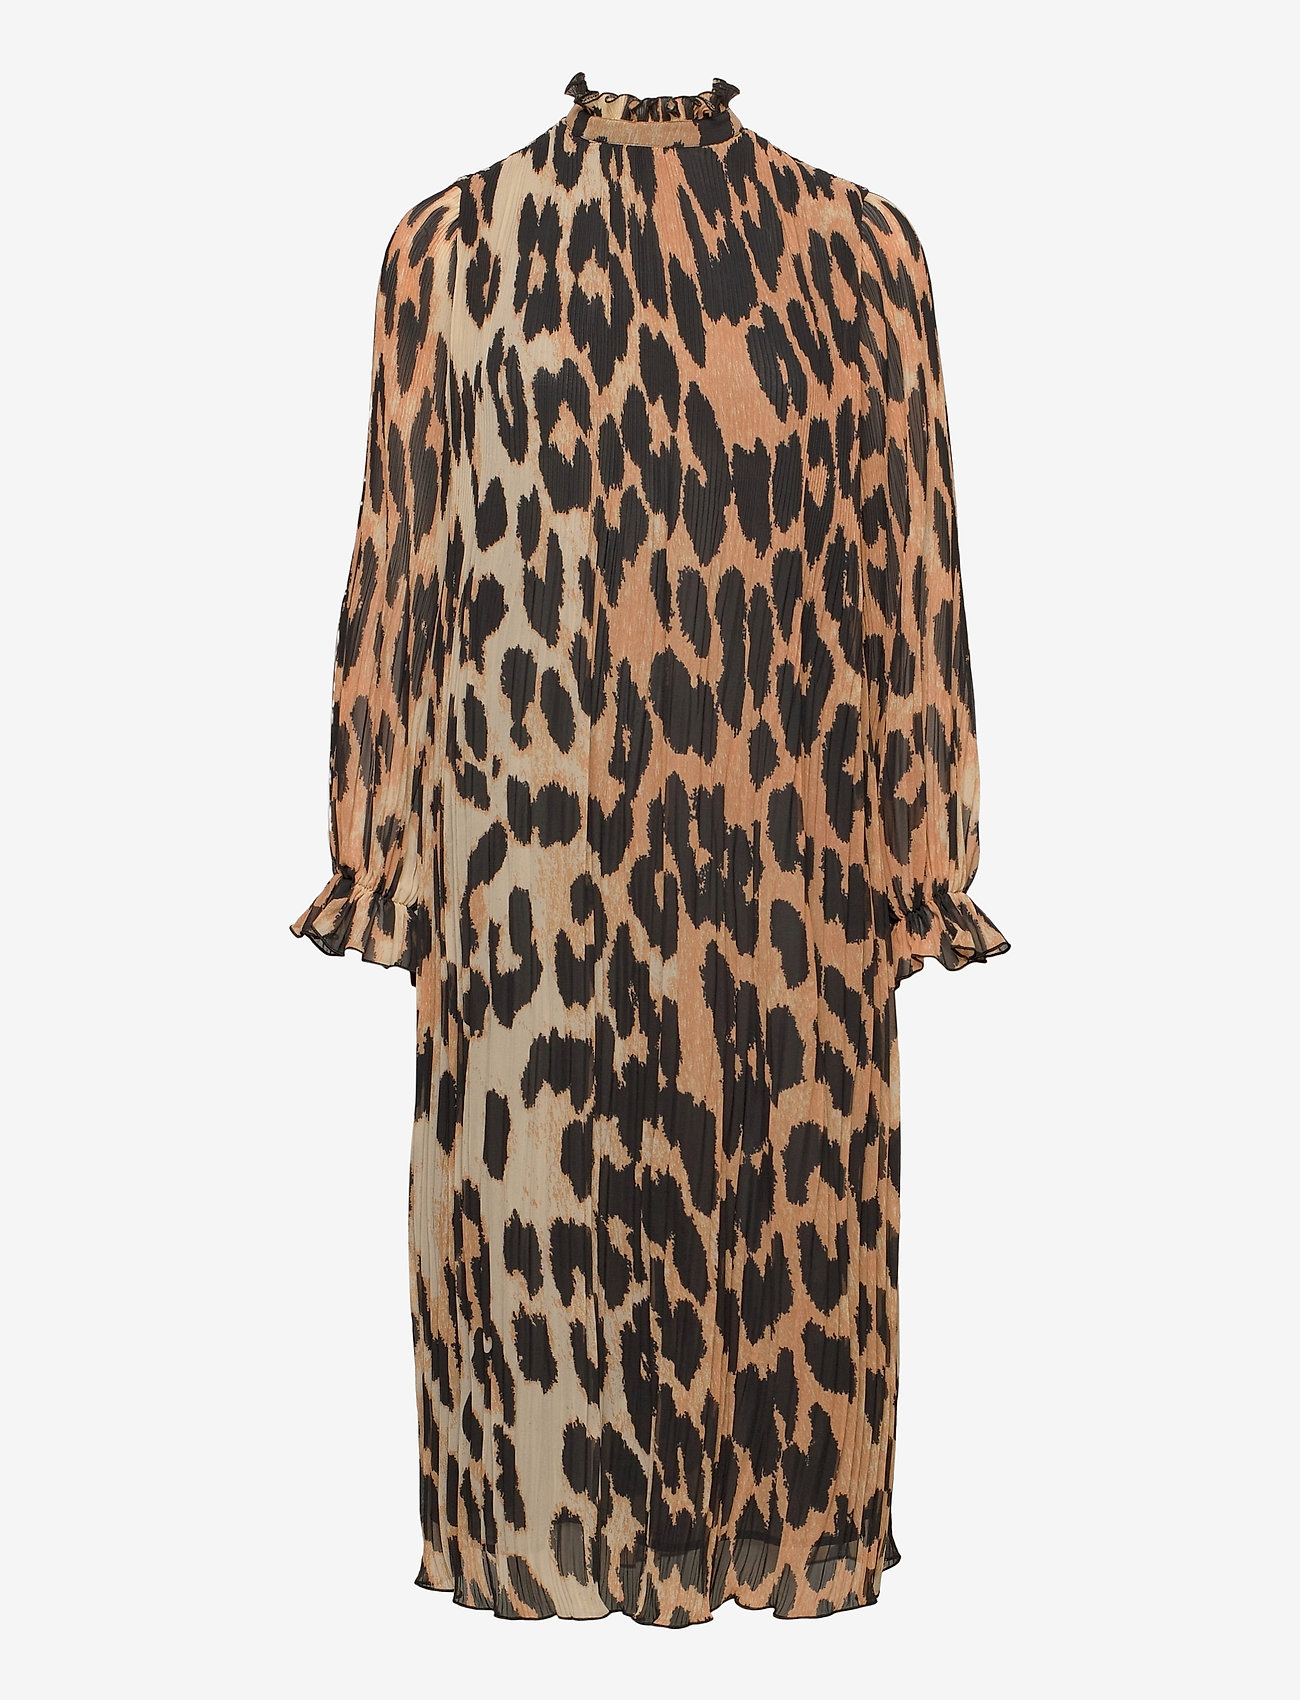 Ganni - Dress - cocktail dresses - maxi leopard - 1